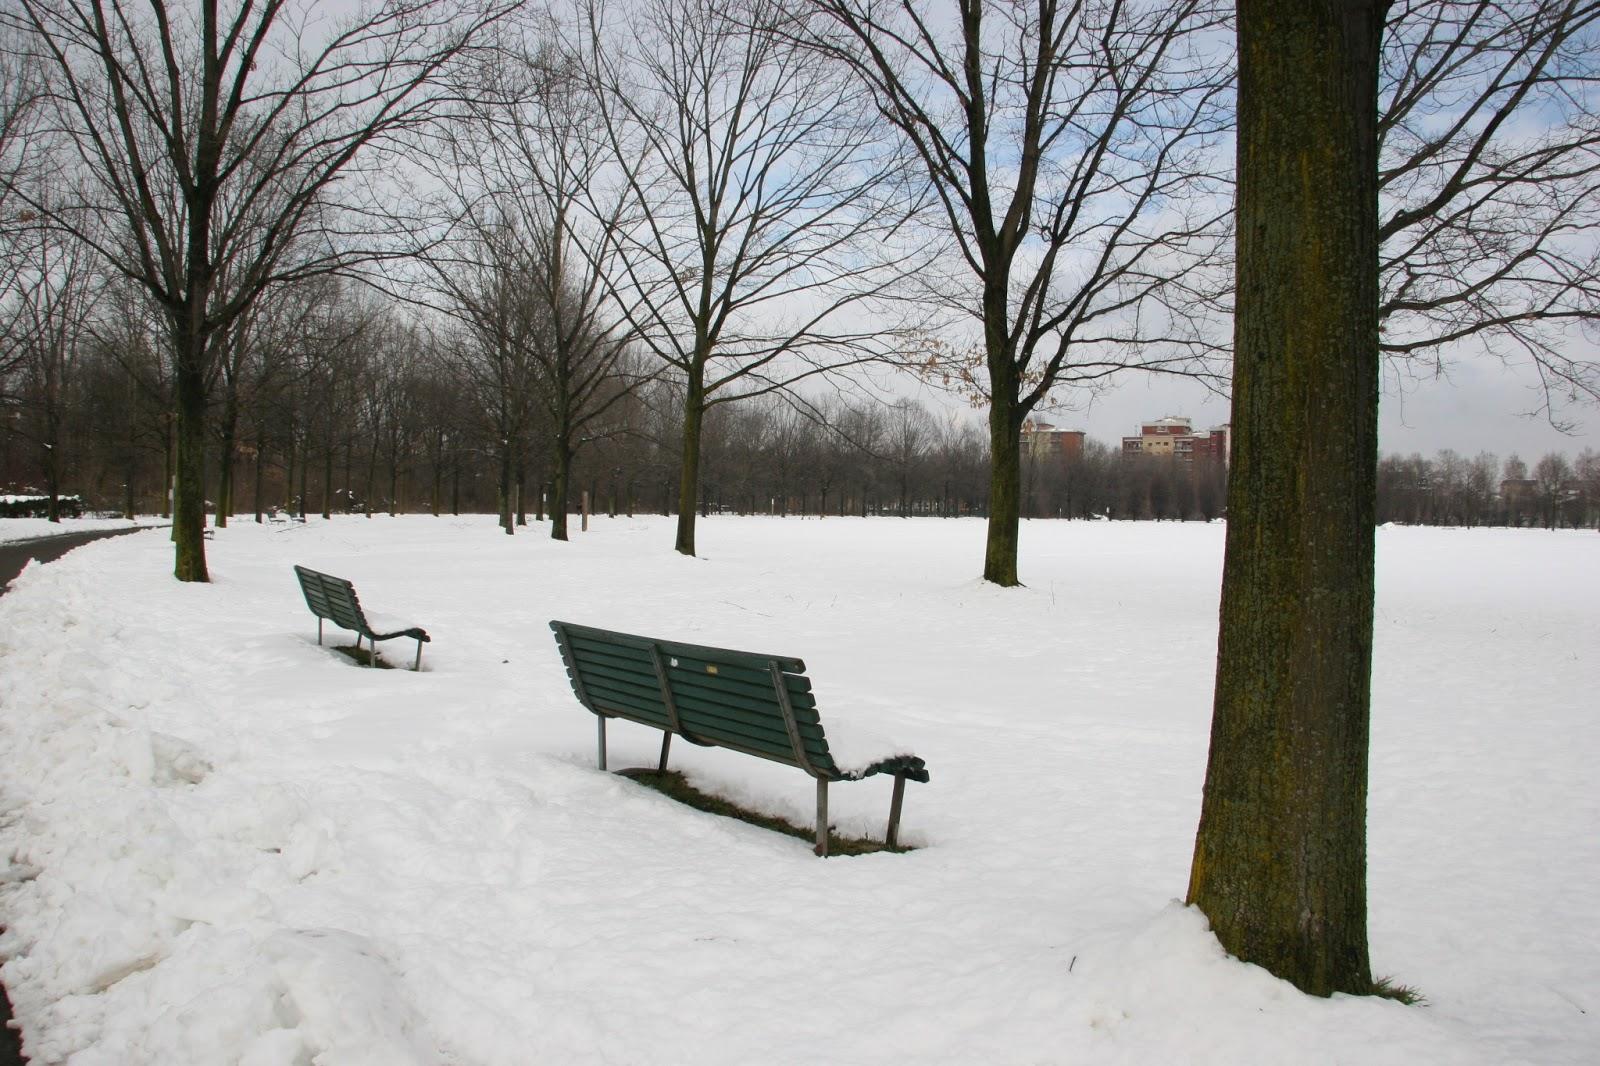 Panchina Con Neve Panchina Con Neve Di Sera Doo Le 18 Alepal60